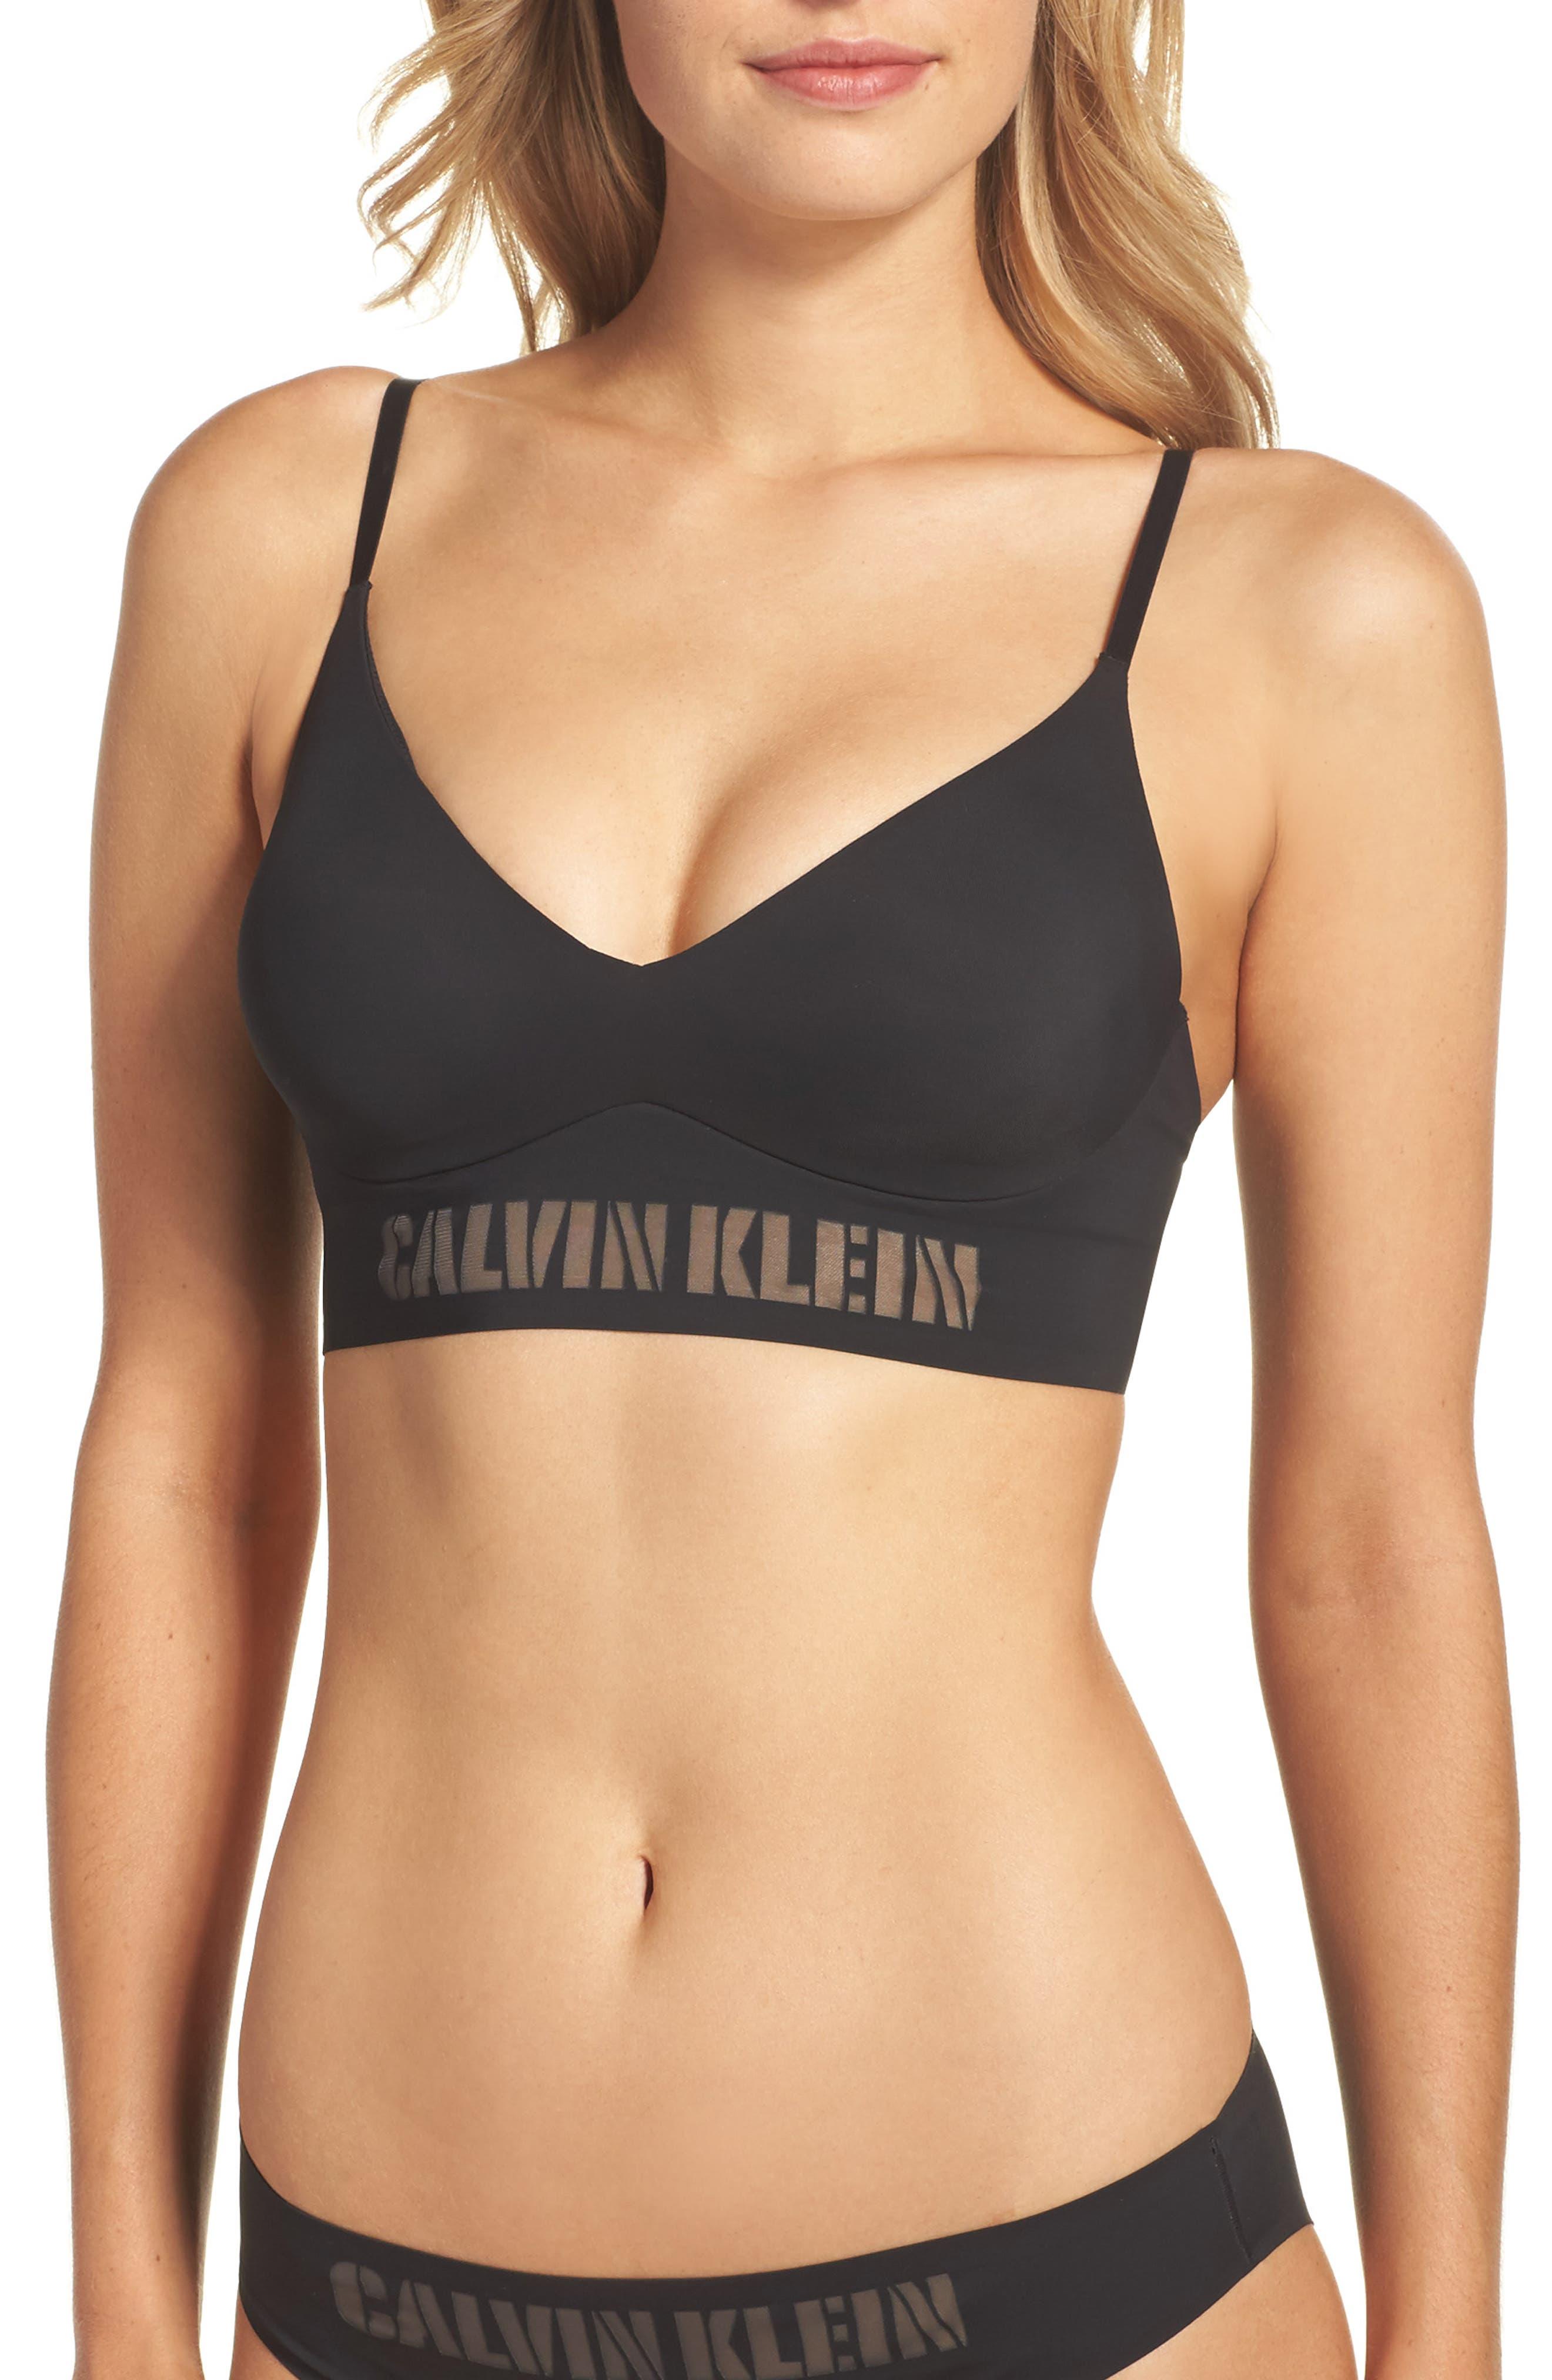 Alternate Image 1 Selected - Calvin Klein Laser Wireless Triangle Bra